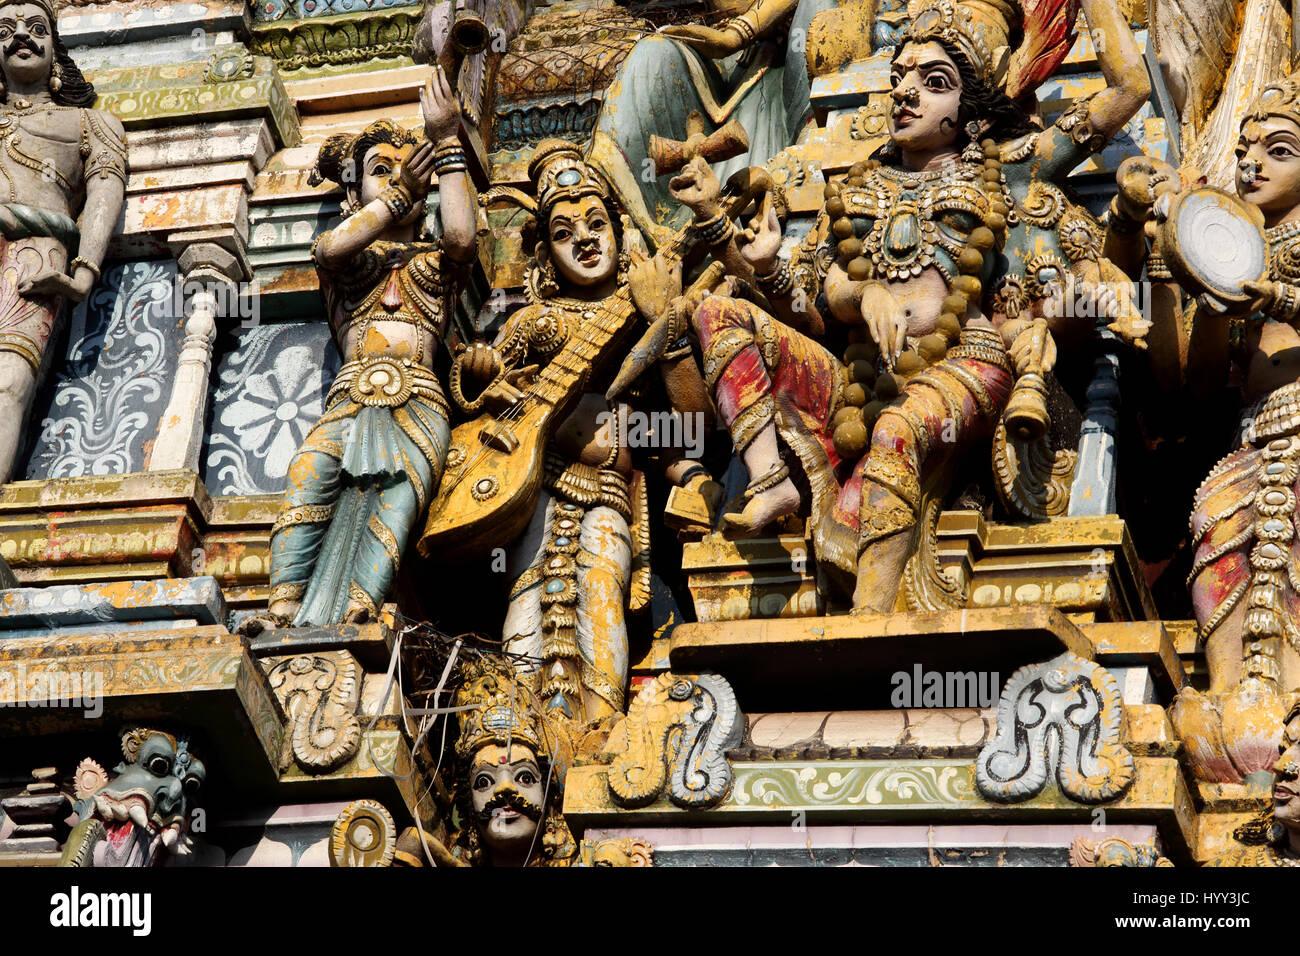 Pettah Colombo Sri Lanka New Kathiresan Kovil Temple Dedicated To War God Murugan Close Up Of Hindu Gods - Stock Image